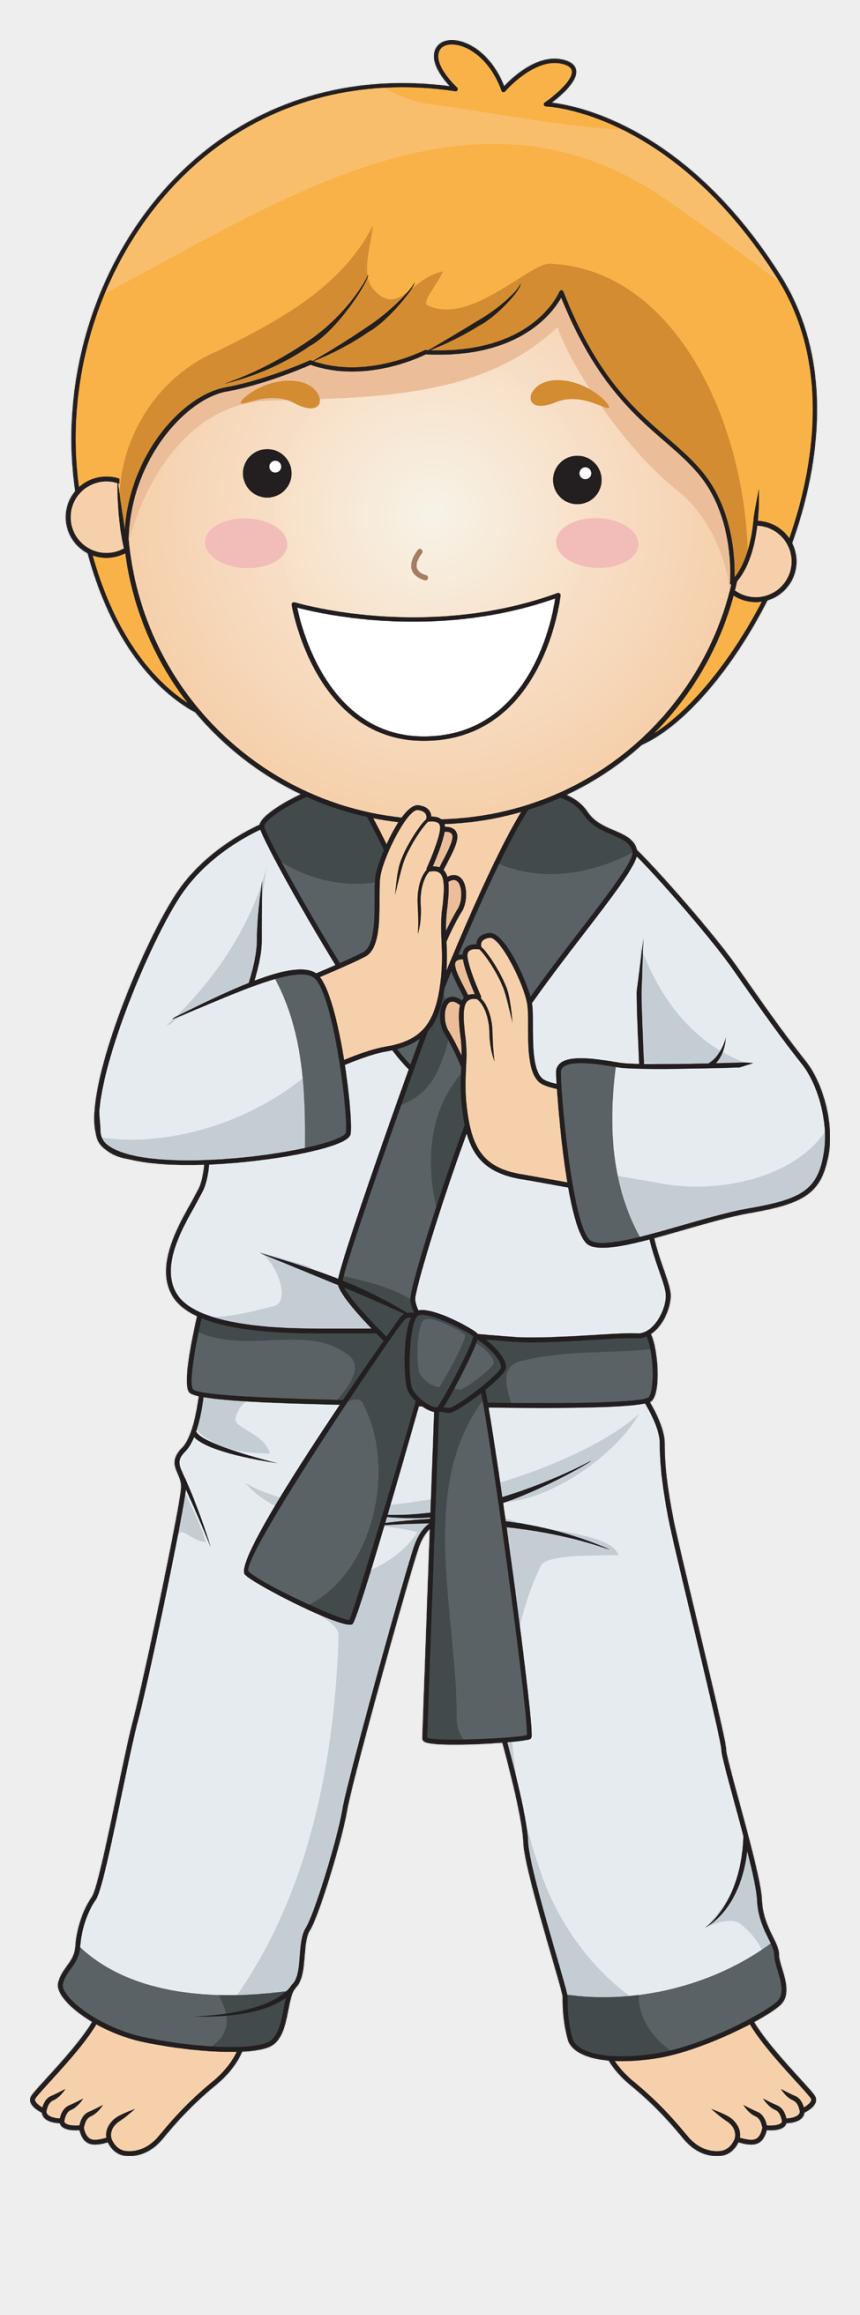 taekwondo clipart, Cartoons - Taekwondo Clip Art Boys - Sack Race Clip Art